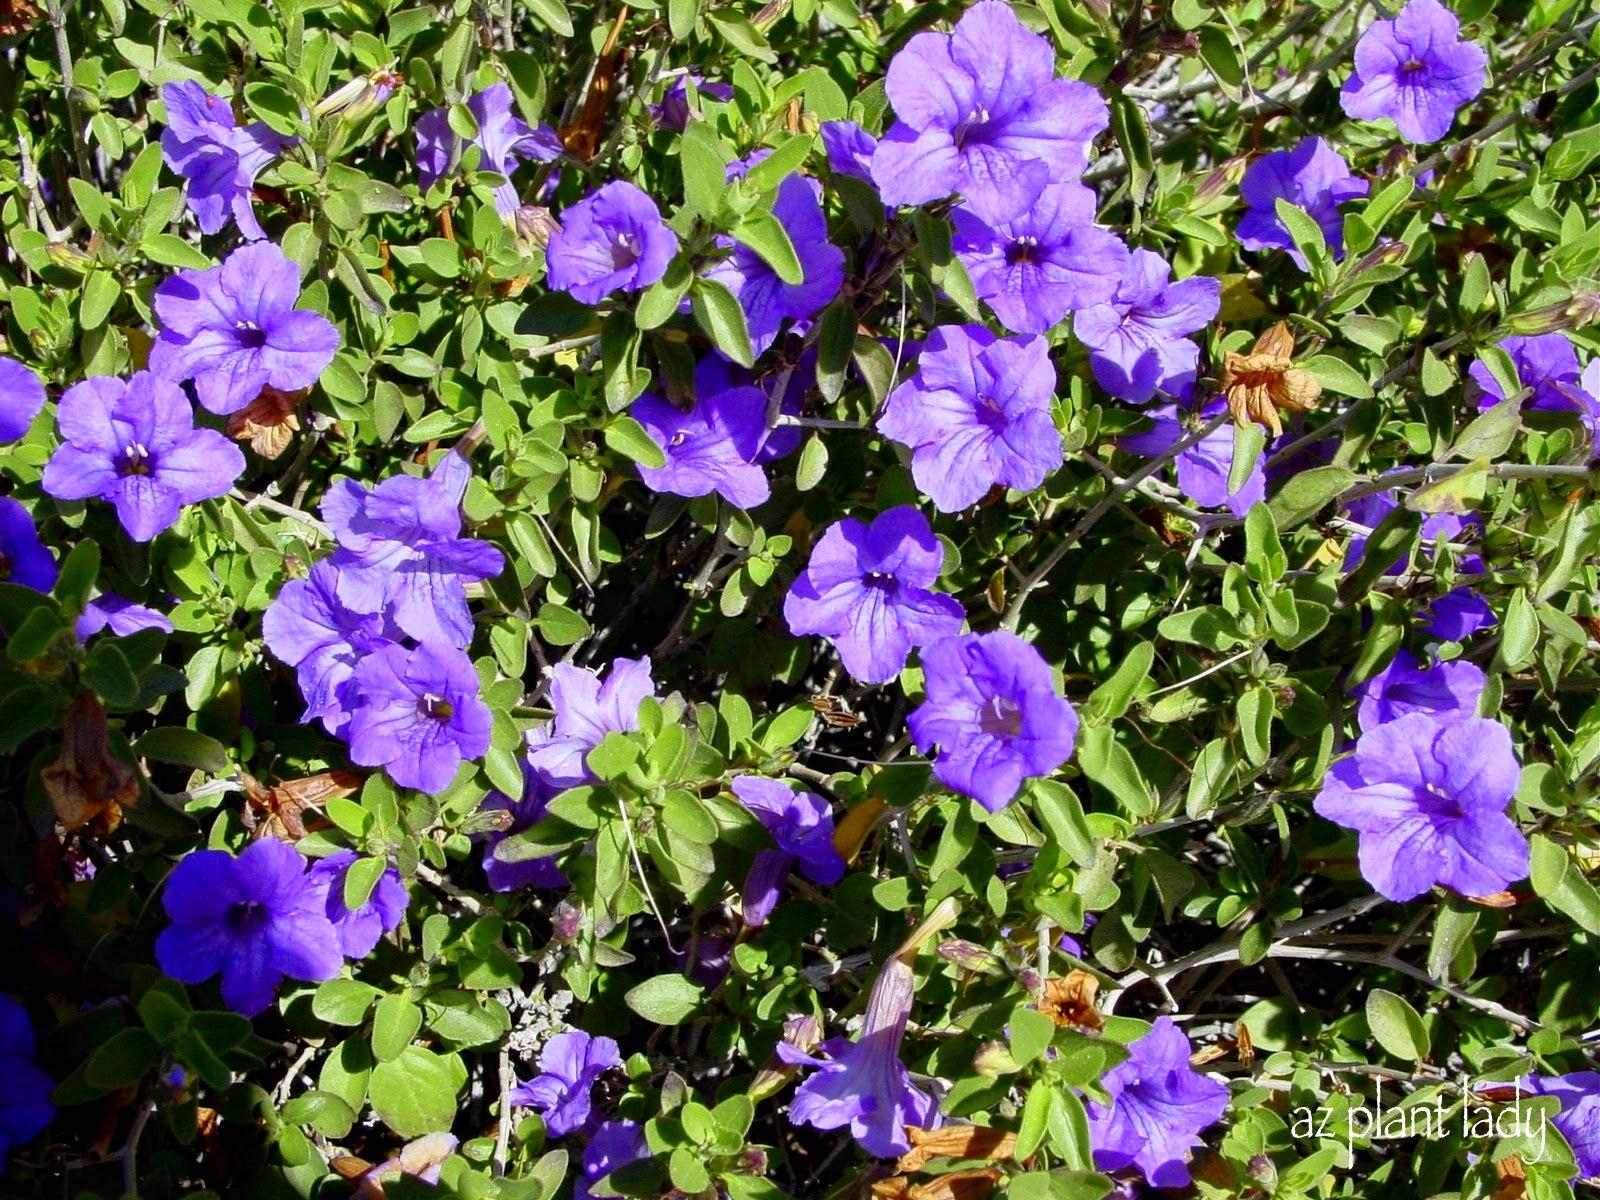 Purple landscaping shrubs : Ramblings from a desert garden purple flowering